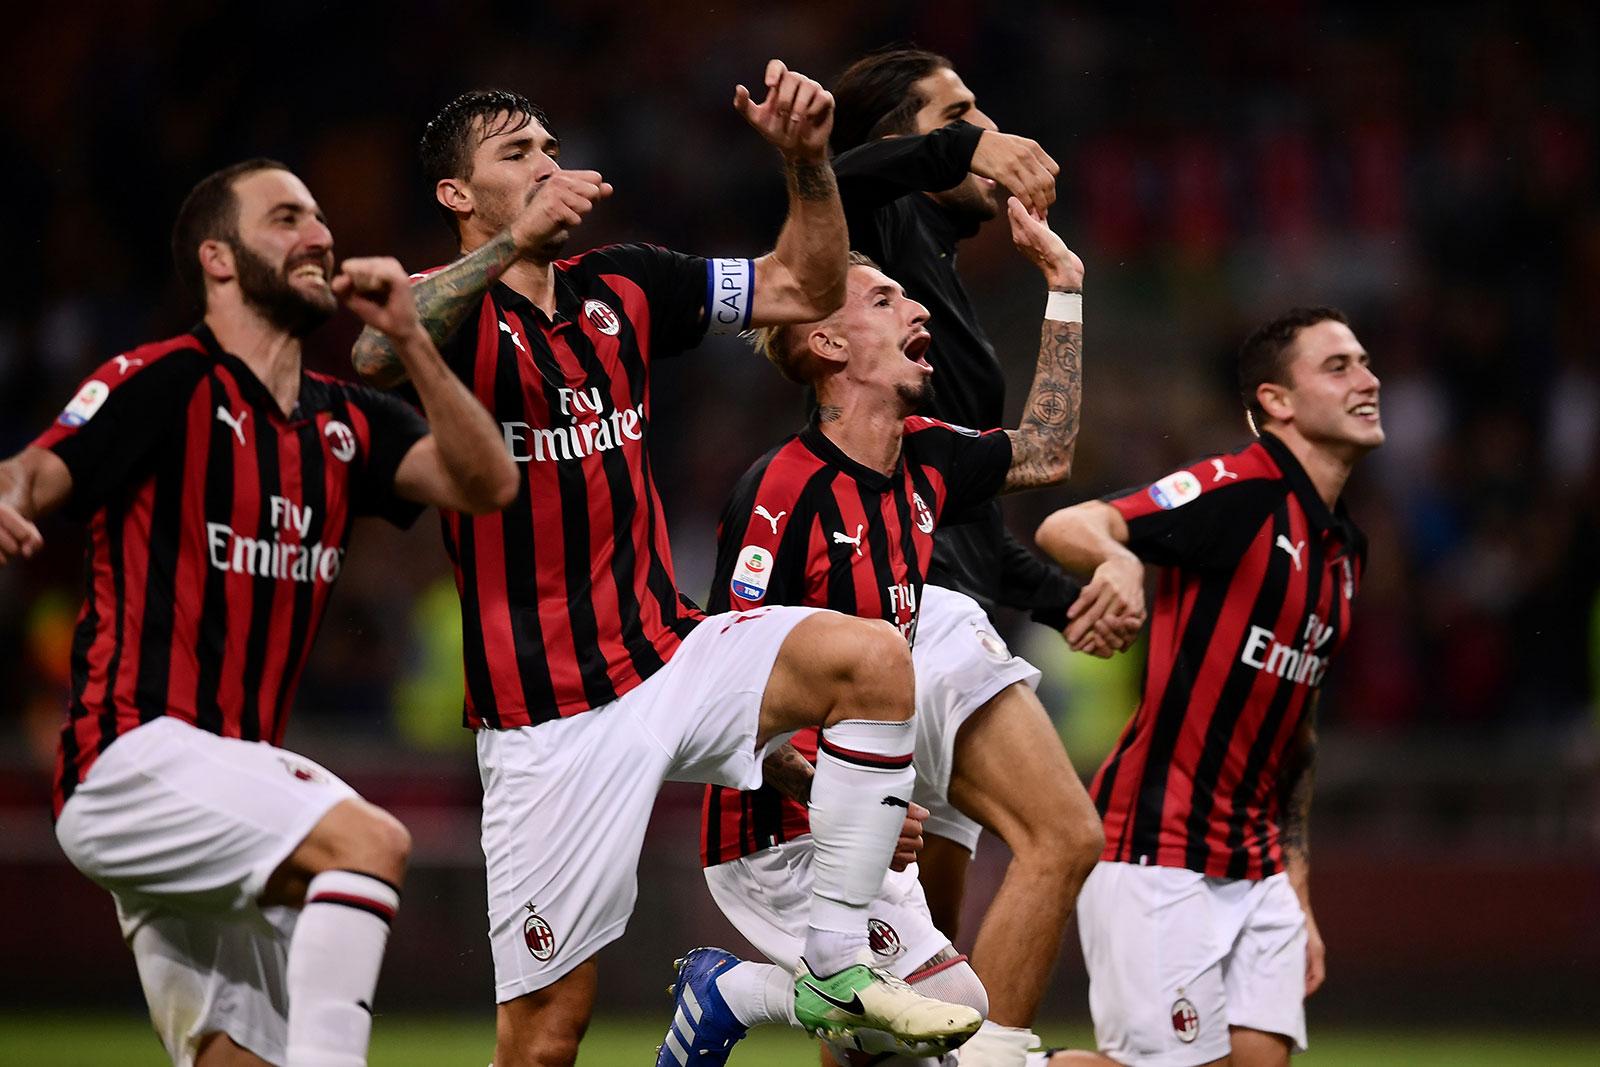 Gonzalo Higuain, Alessio Romagnoli, Samu Castillejo, Ricardo Rodriguez and Davide Calabria celebrating at the end of Milan-Roma at Stadio San Siro on August 31, 2018. (MARCO BERTORELLO/AFP/Getty Images)